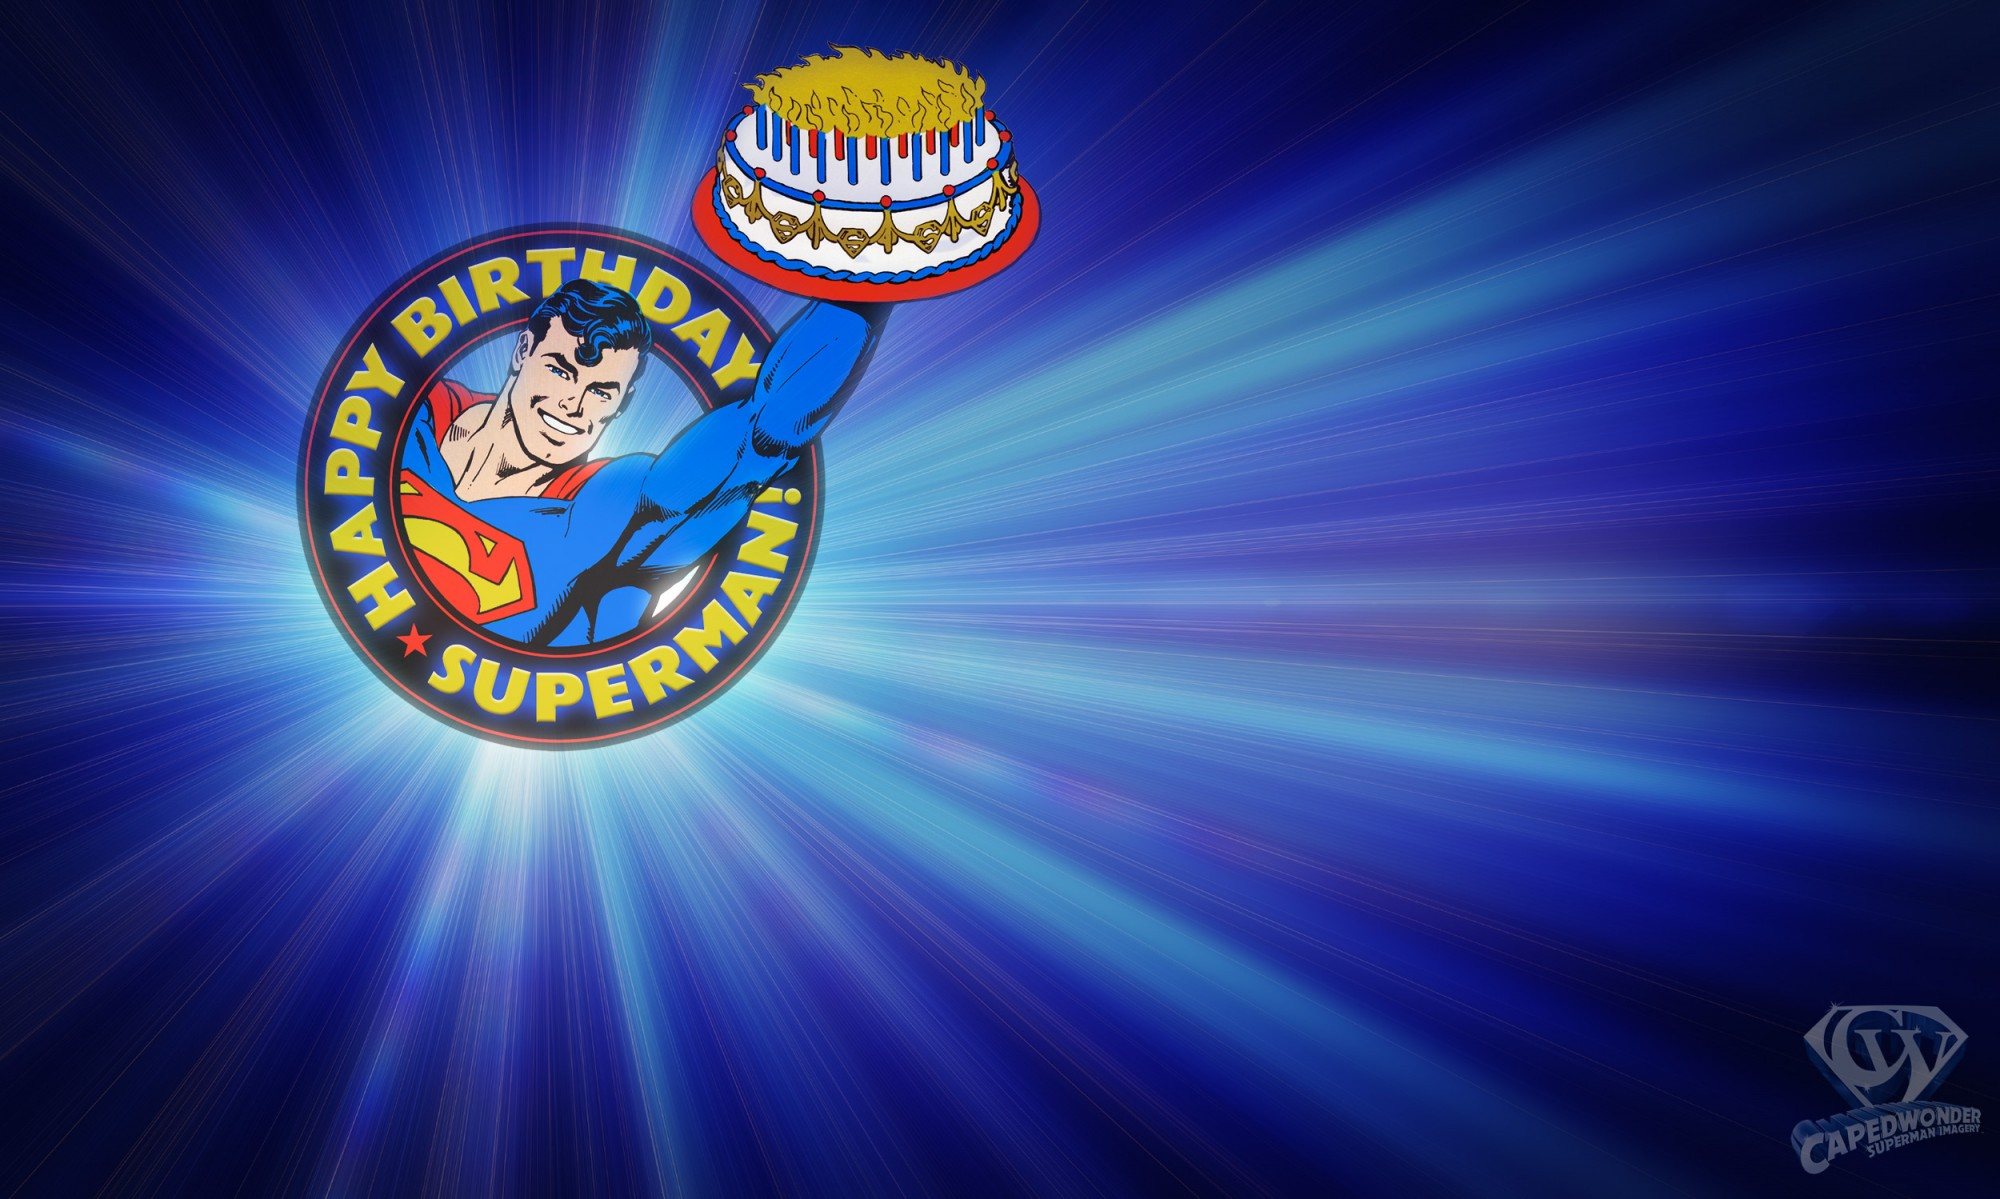 CW-Superman-birthday-2016